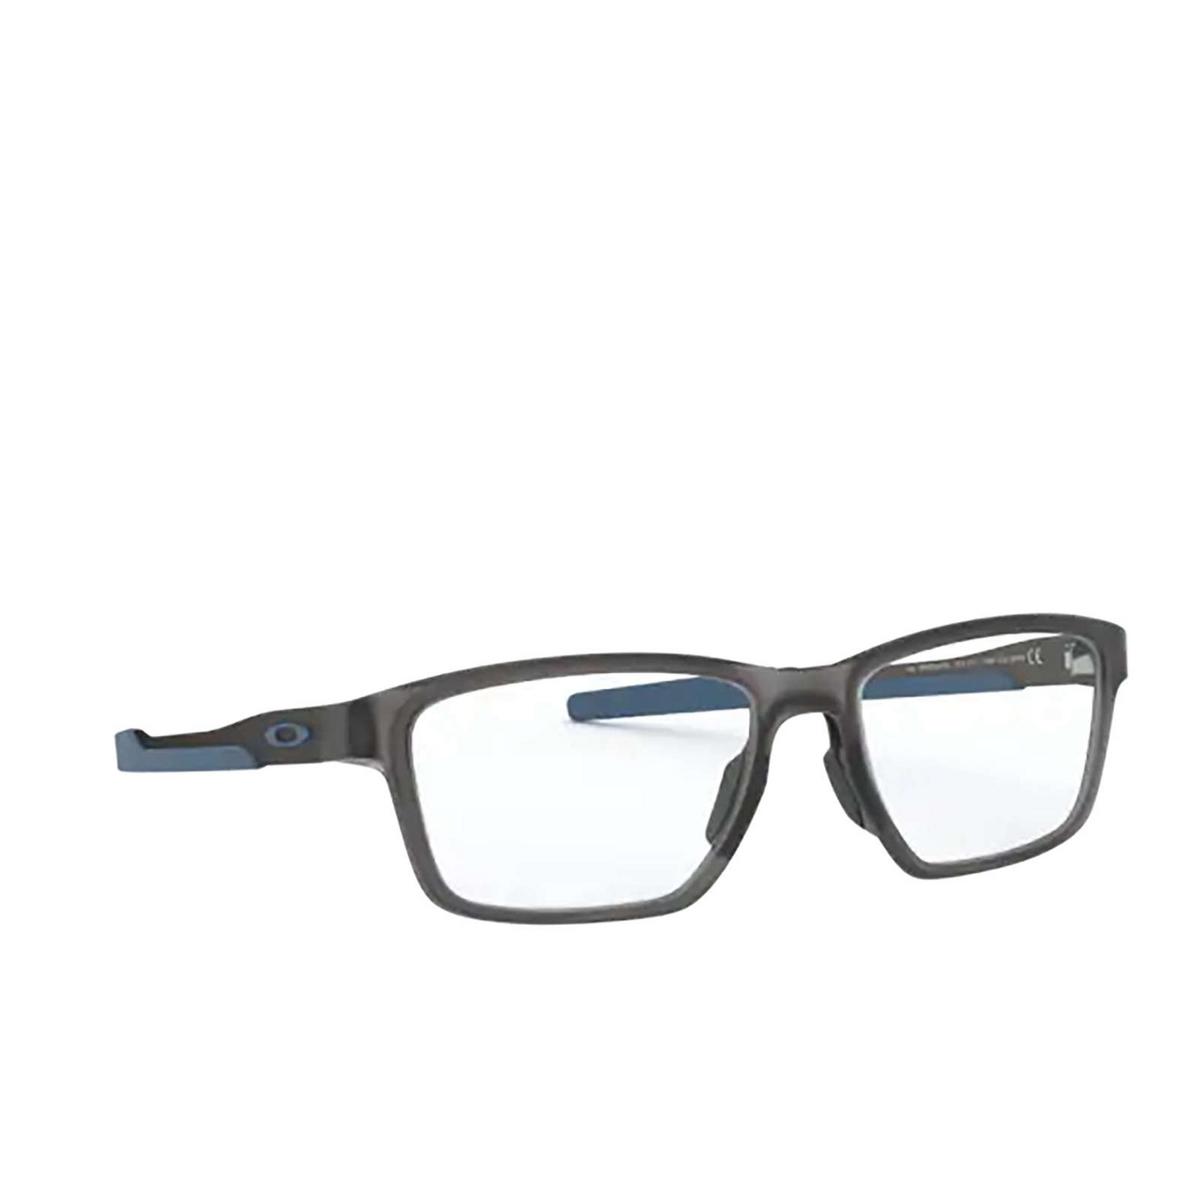 Oakley® Rectangle Eyeglasses: Metalink OX8153 color Satin Grey Smoke 815307 - three-quarters view.